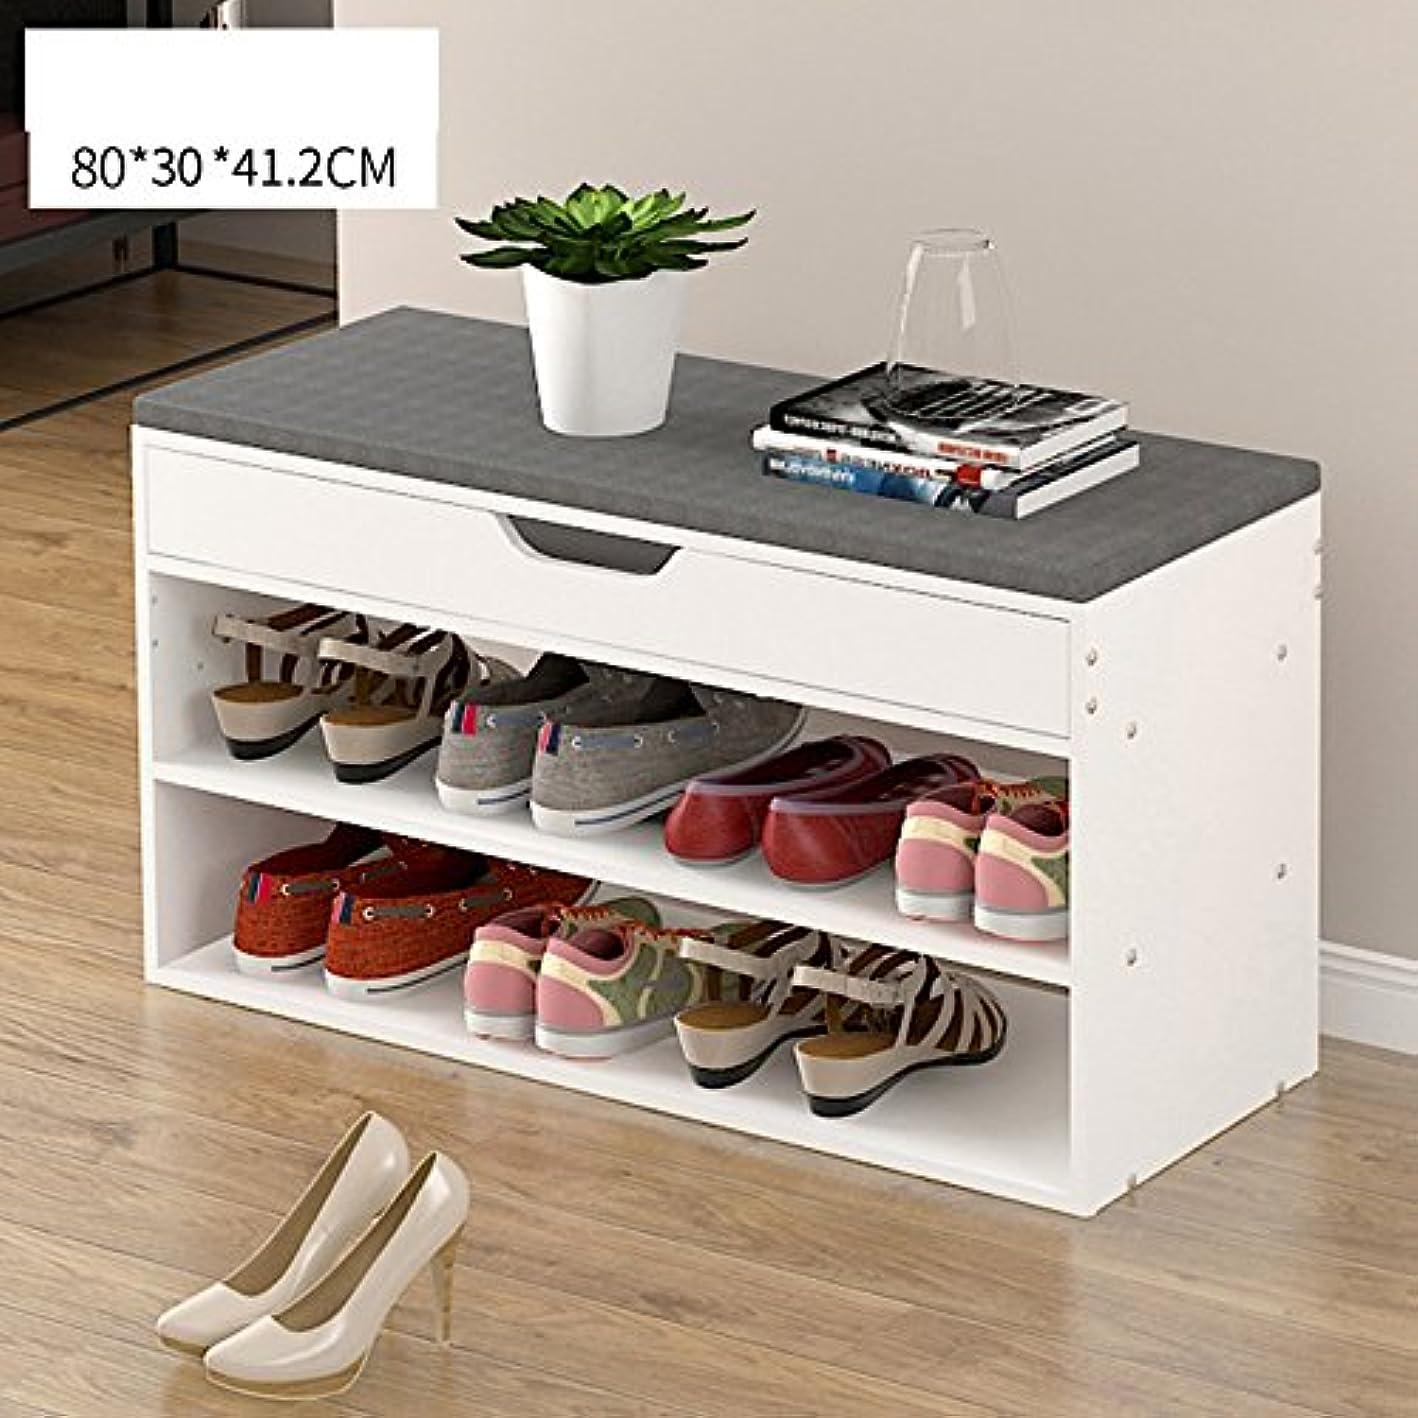 ZHIRONG Shoe Bench Modern Simple Shoe Rack Multifunction Storage Stool Organizer Sofa Stool Bench 803141cm